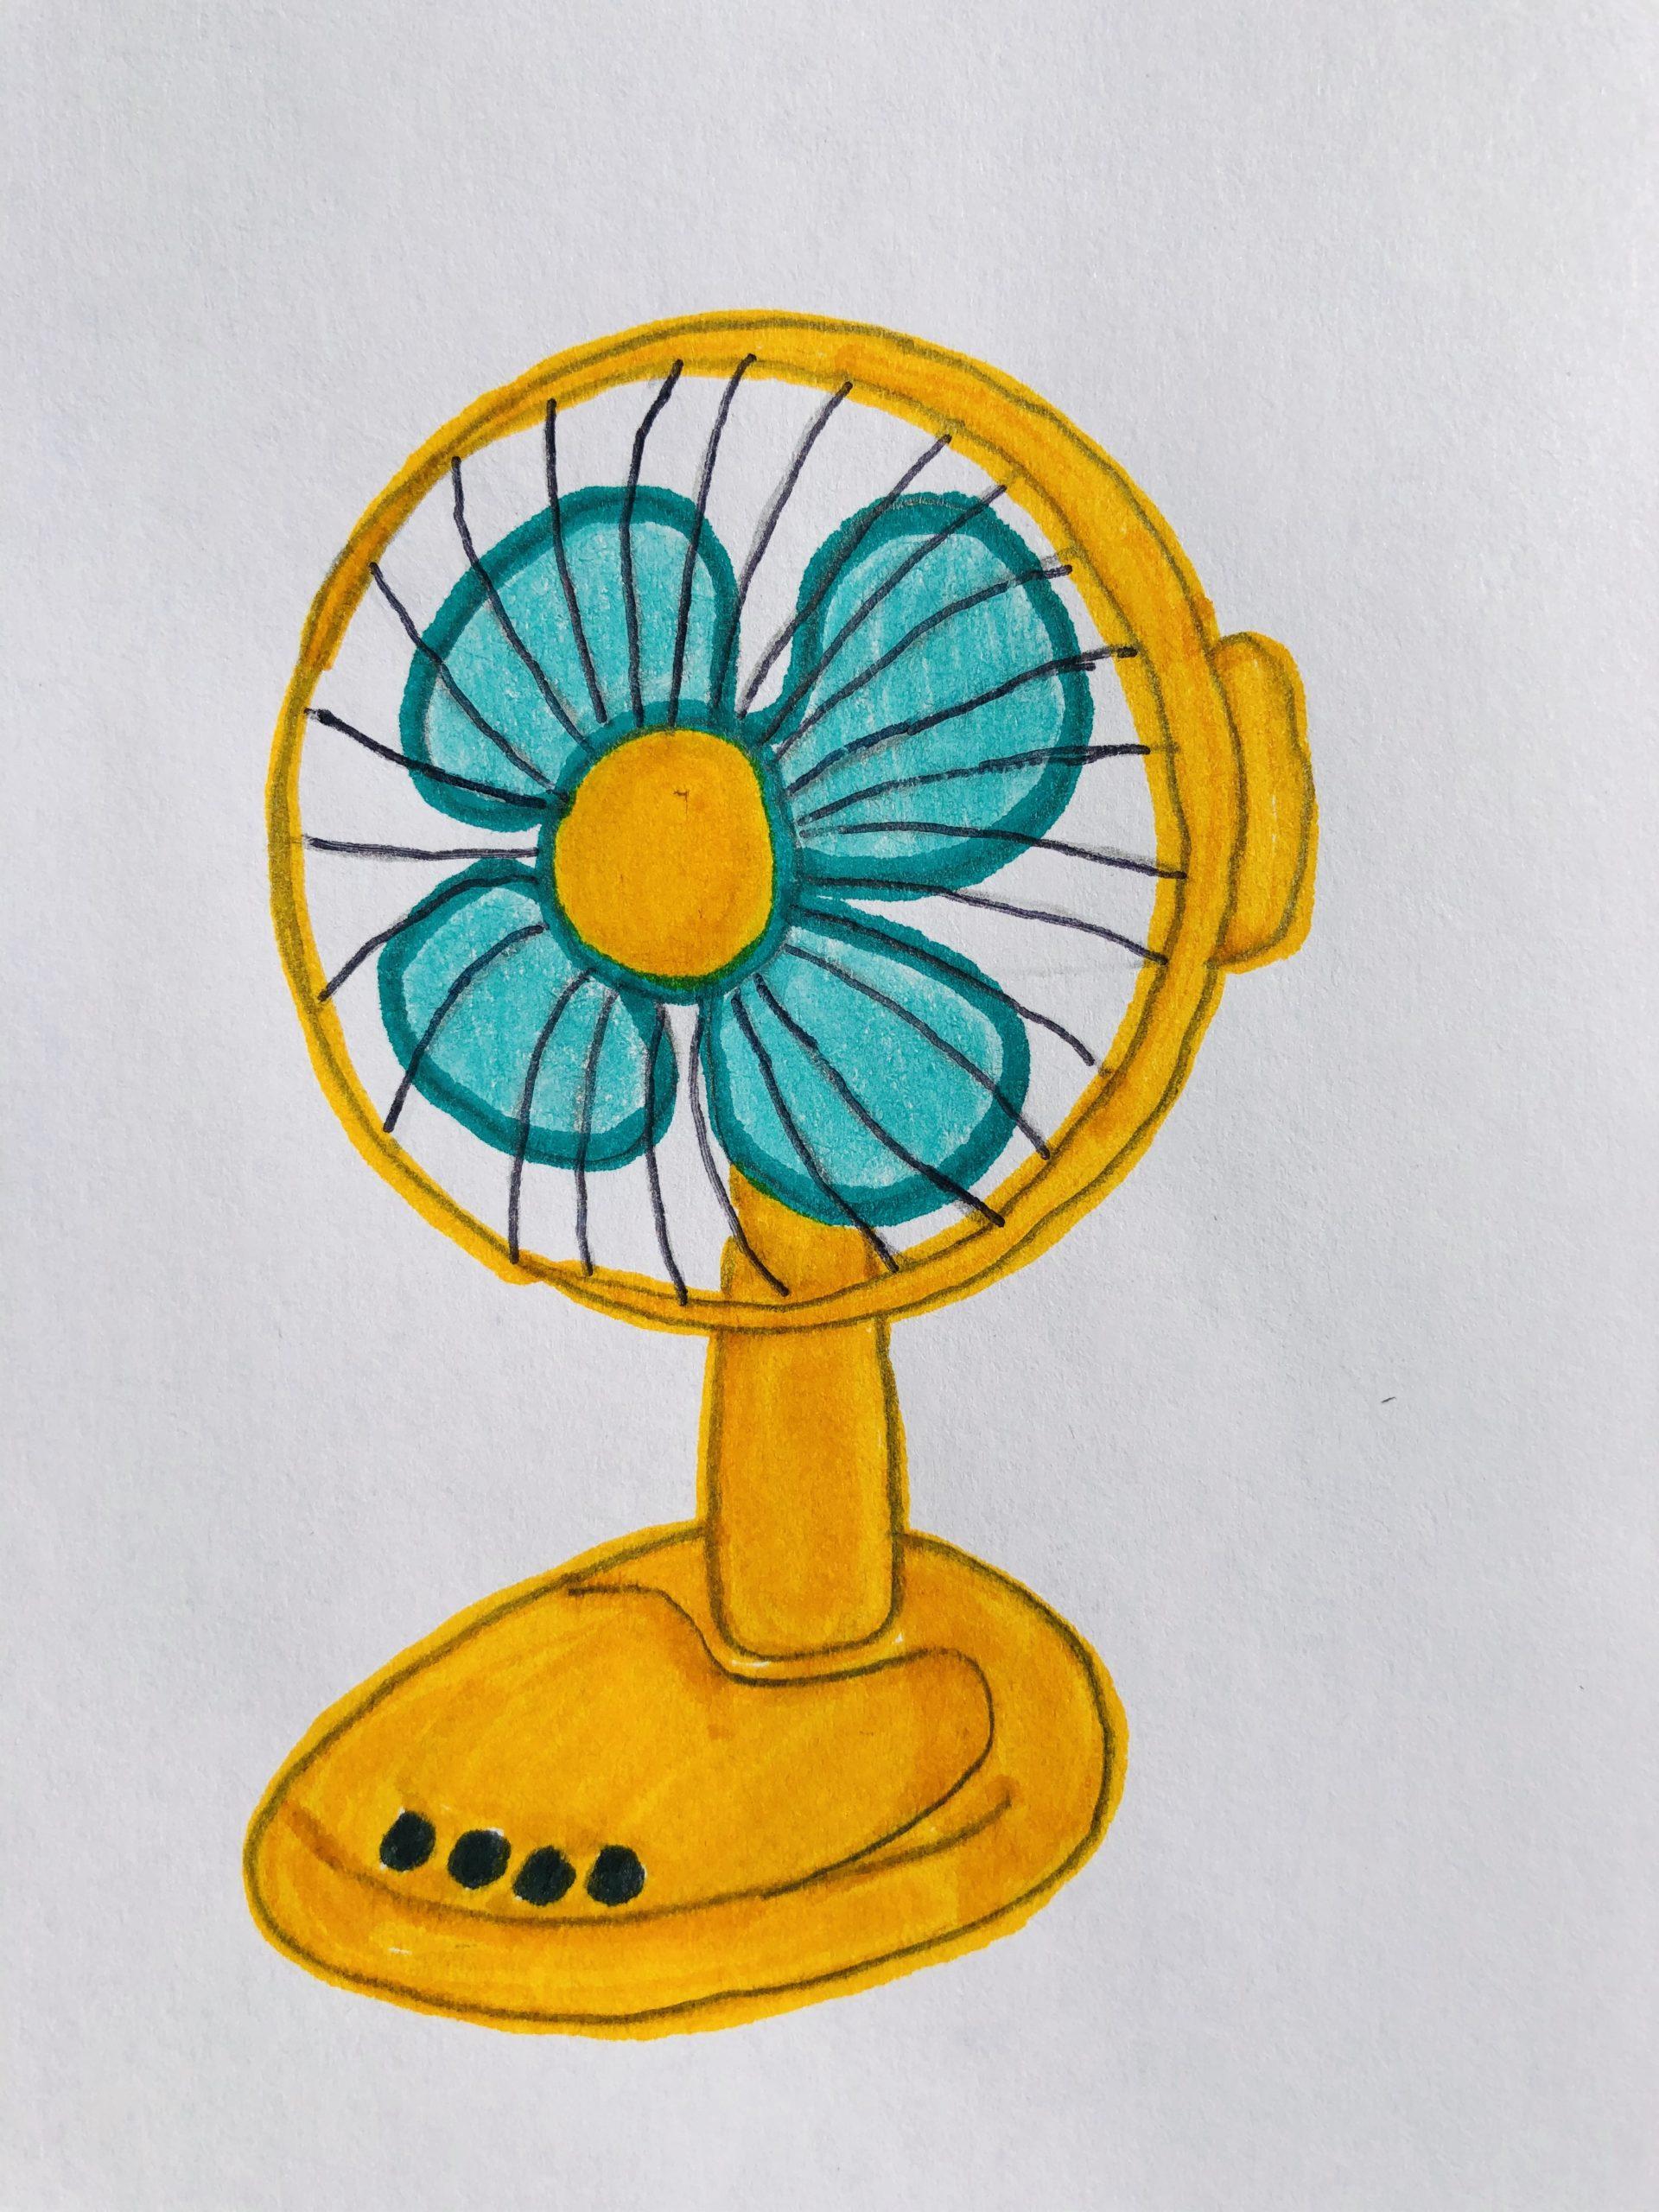 An orange fan with teal blades.